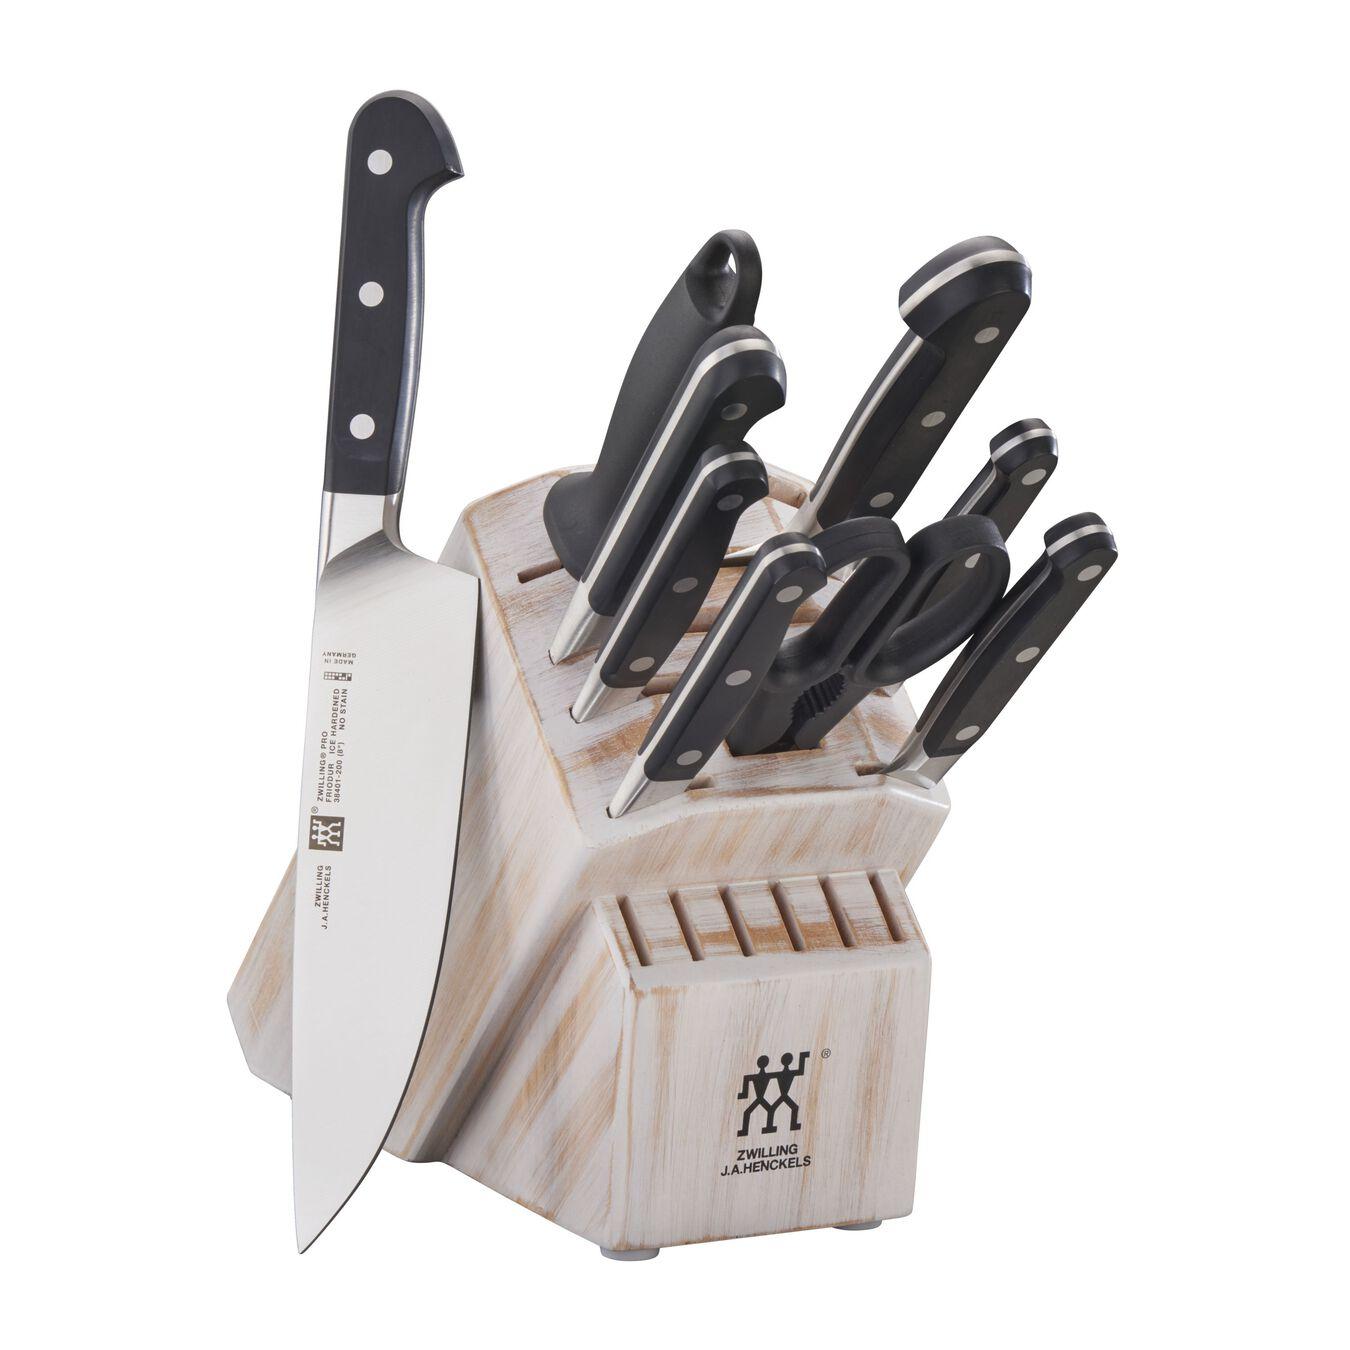 10-pc Knife Block Set - Rustic White,,large 1